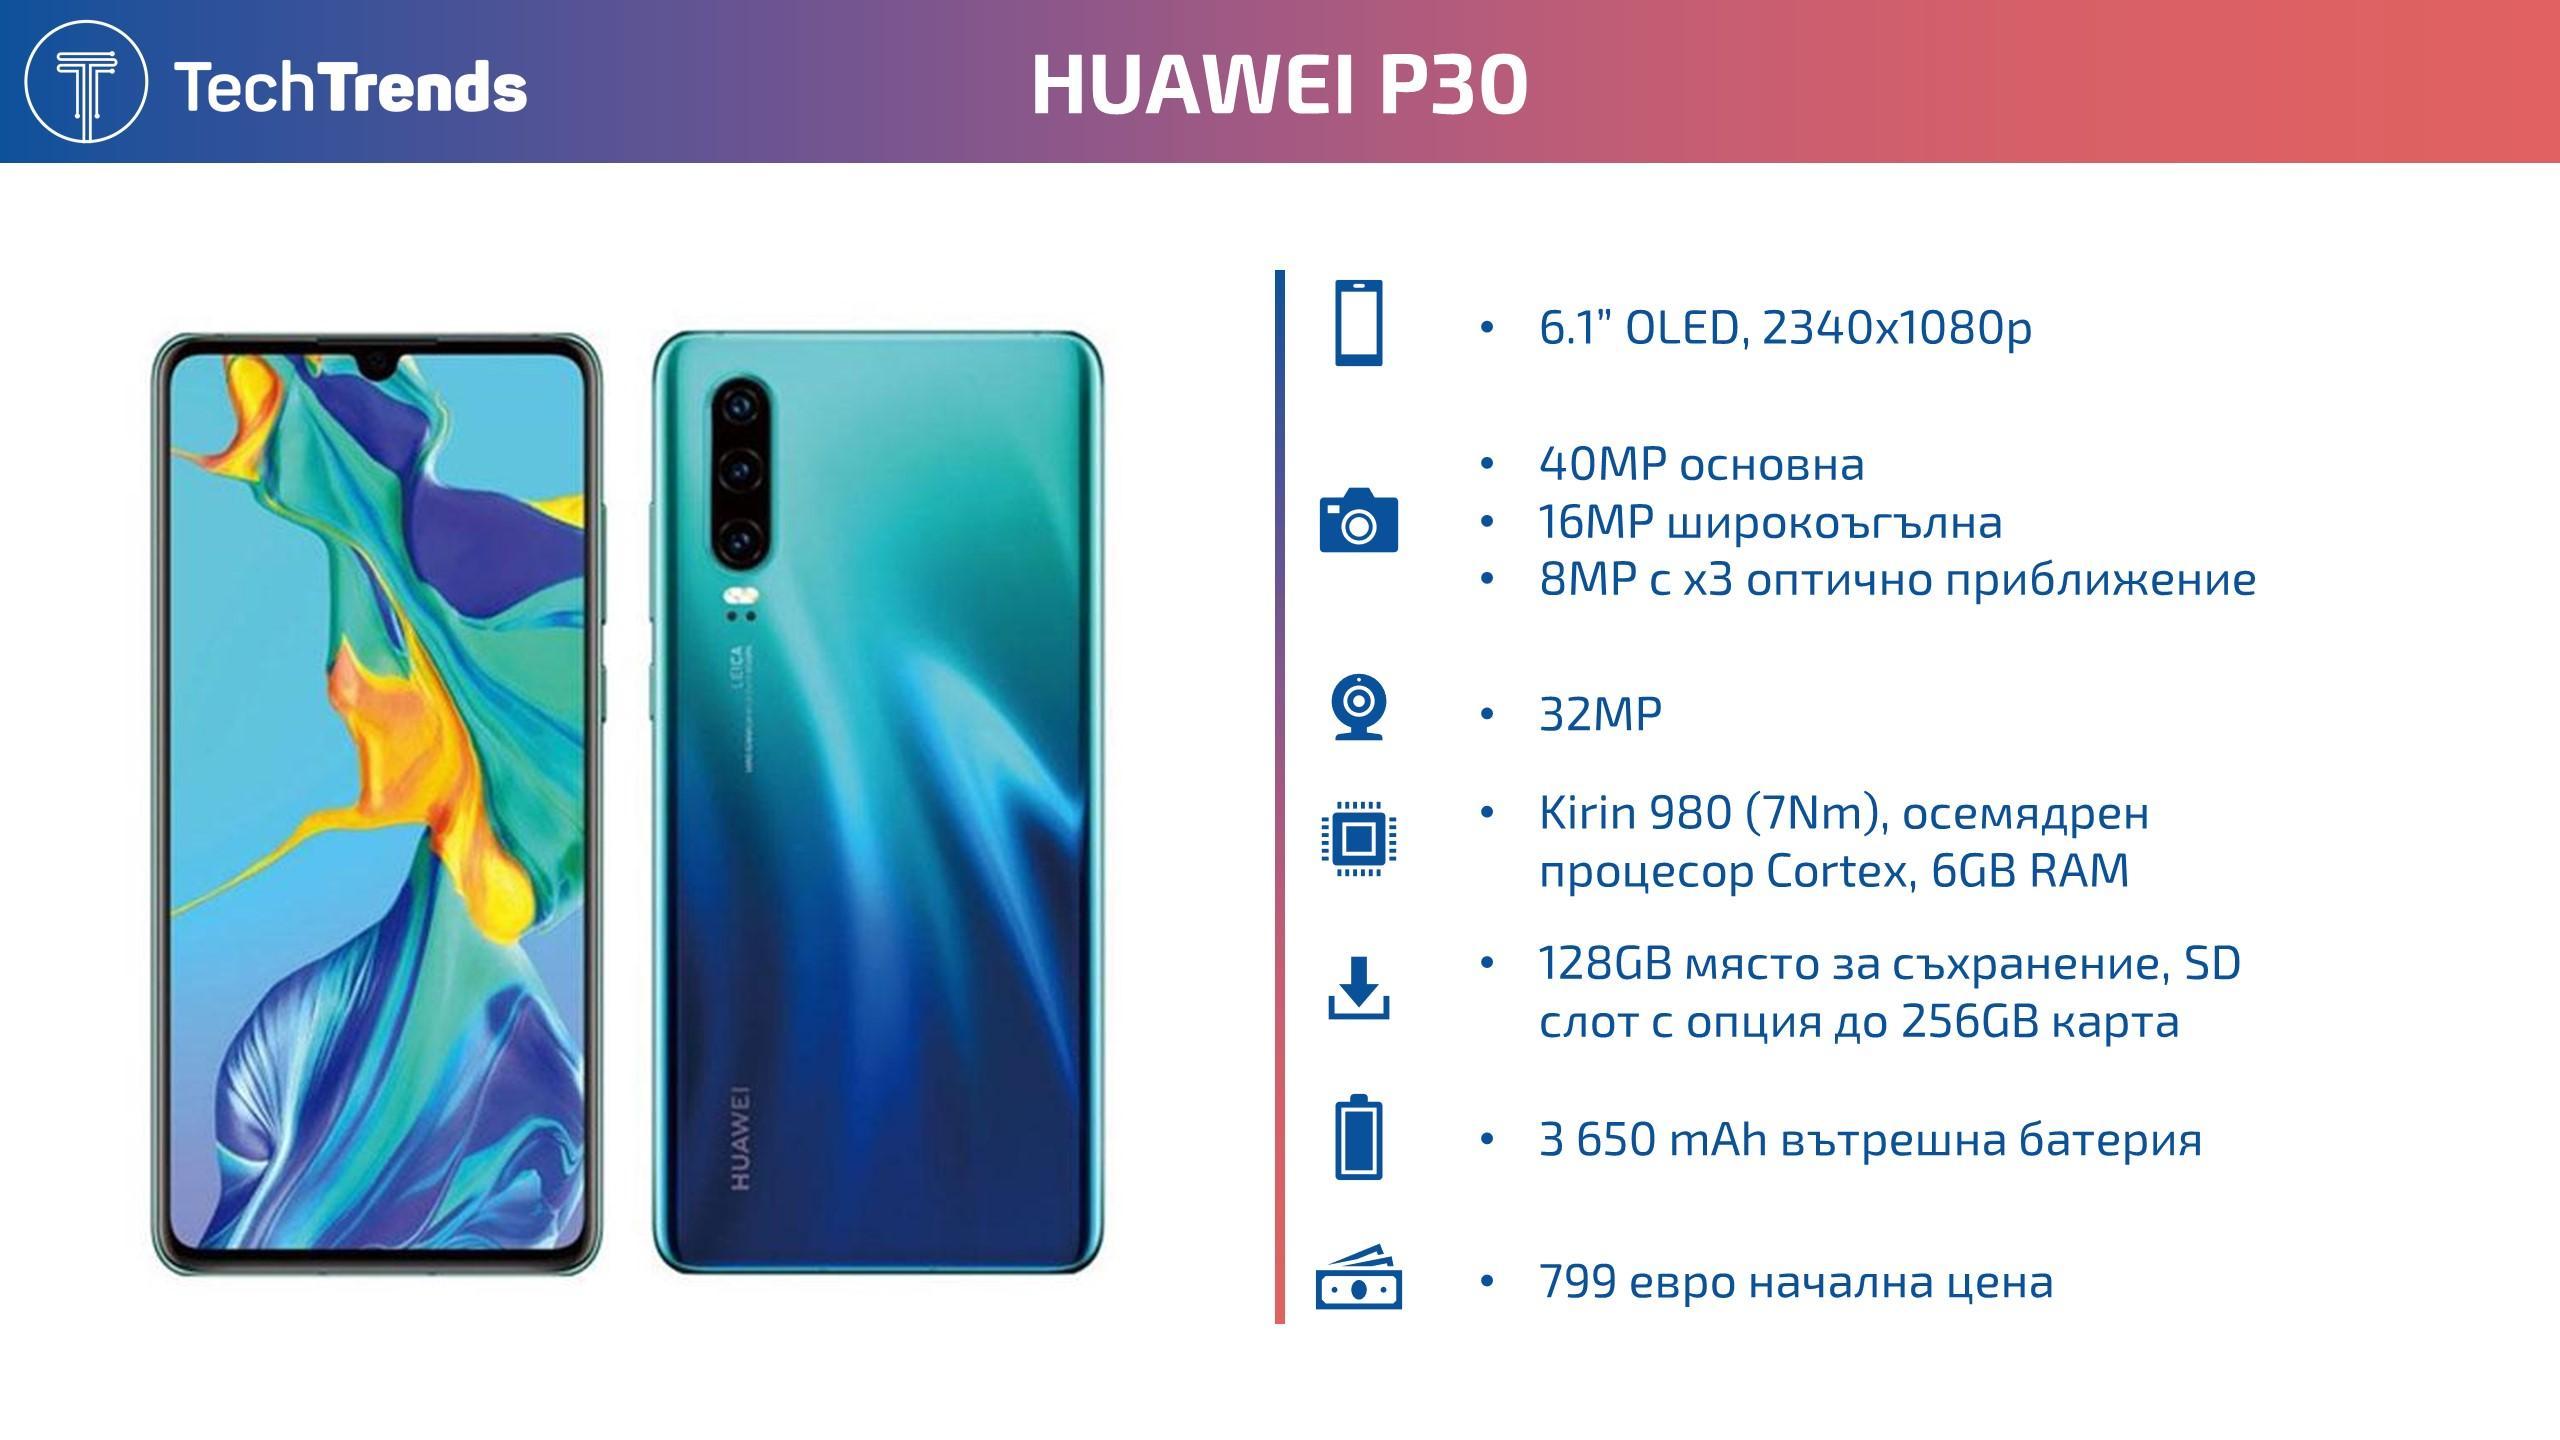 Huawei P30 Specs